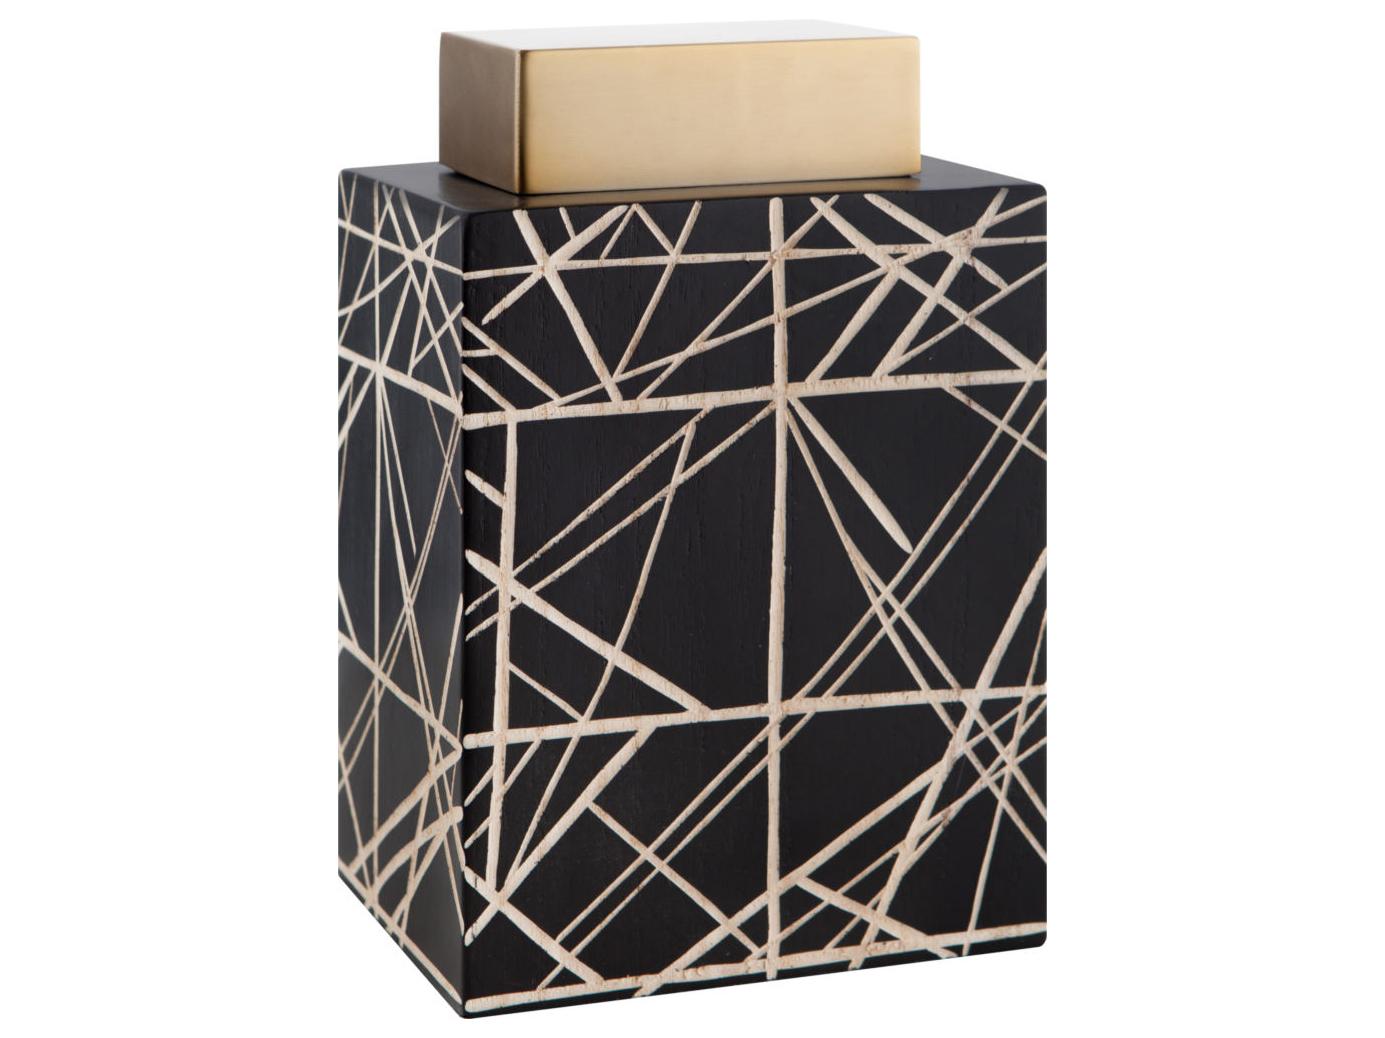 Декоративная ваза M-Style 5290097 от thefurnish